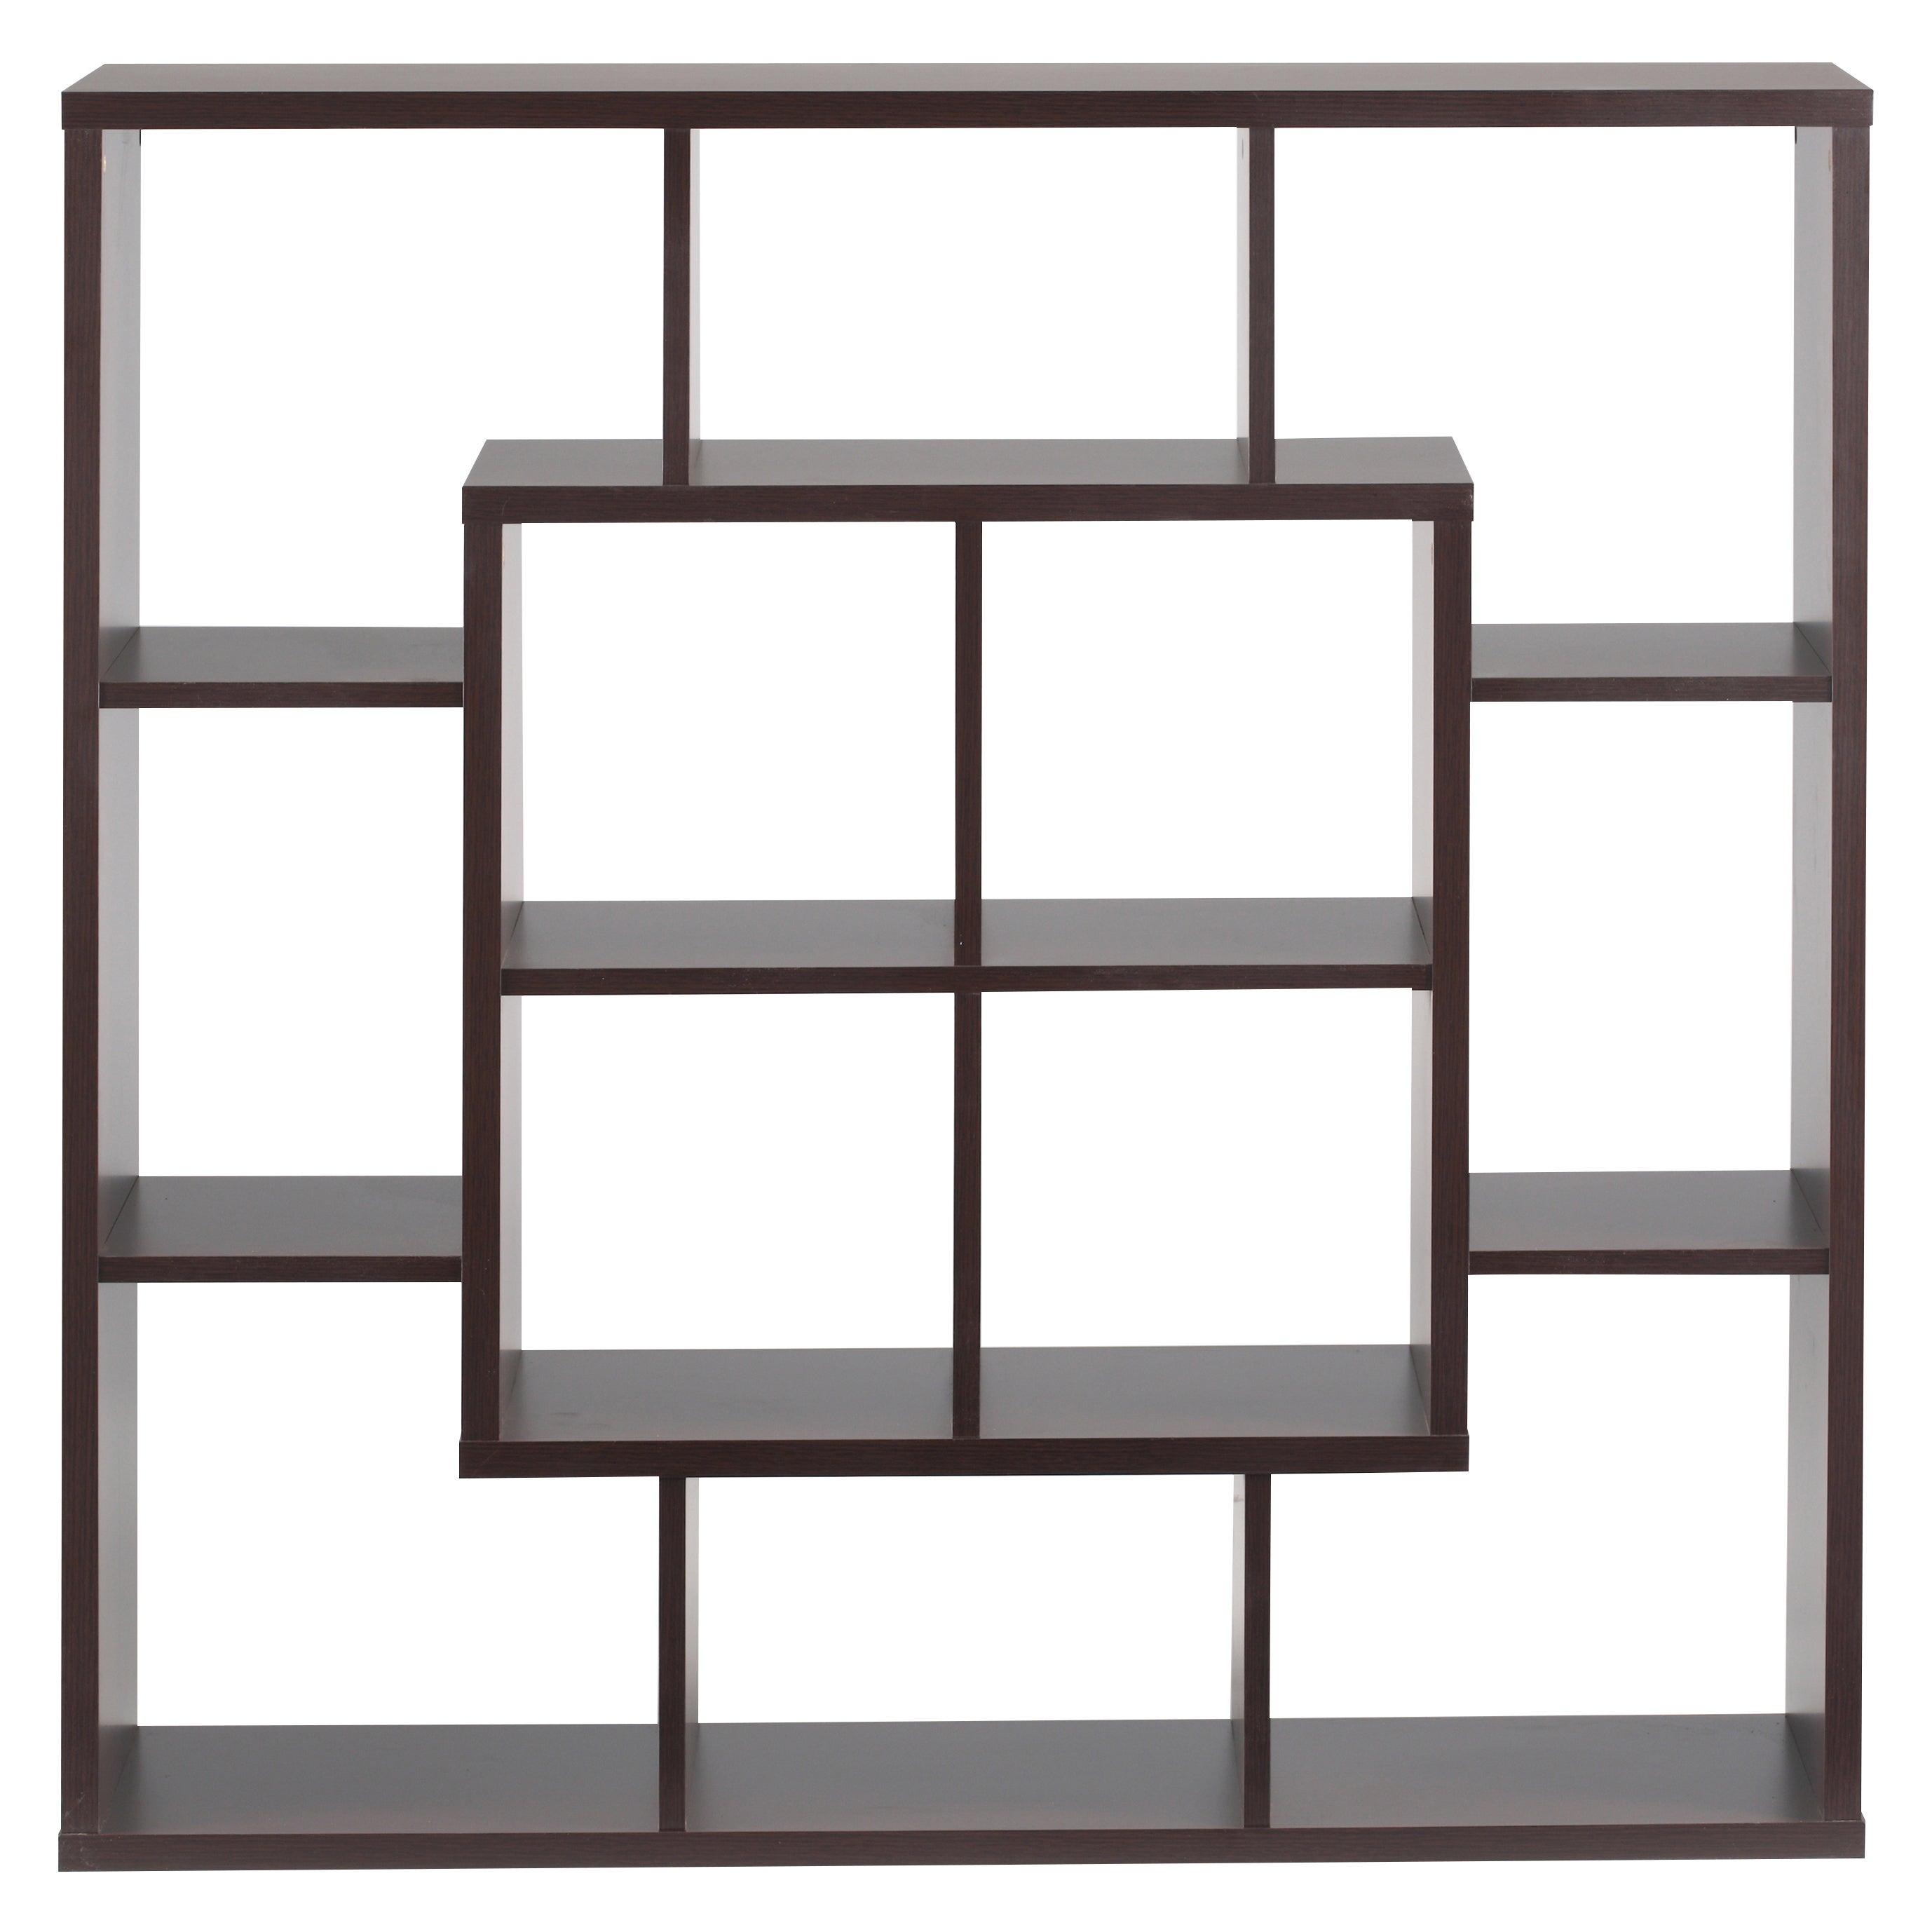 Shop Furniture Of America Aydan Walnut Wood Modern Square Bookshelf Room Divider